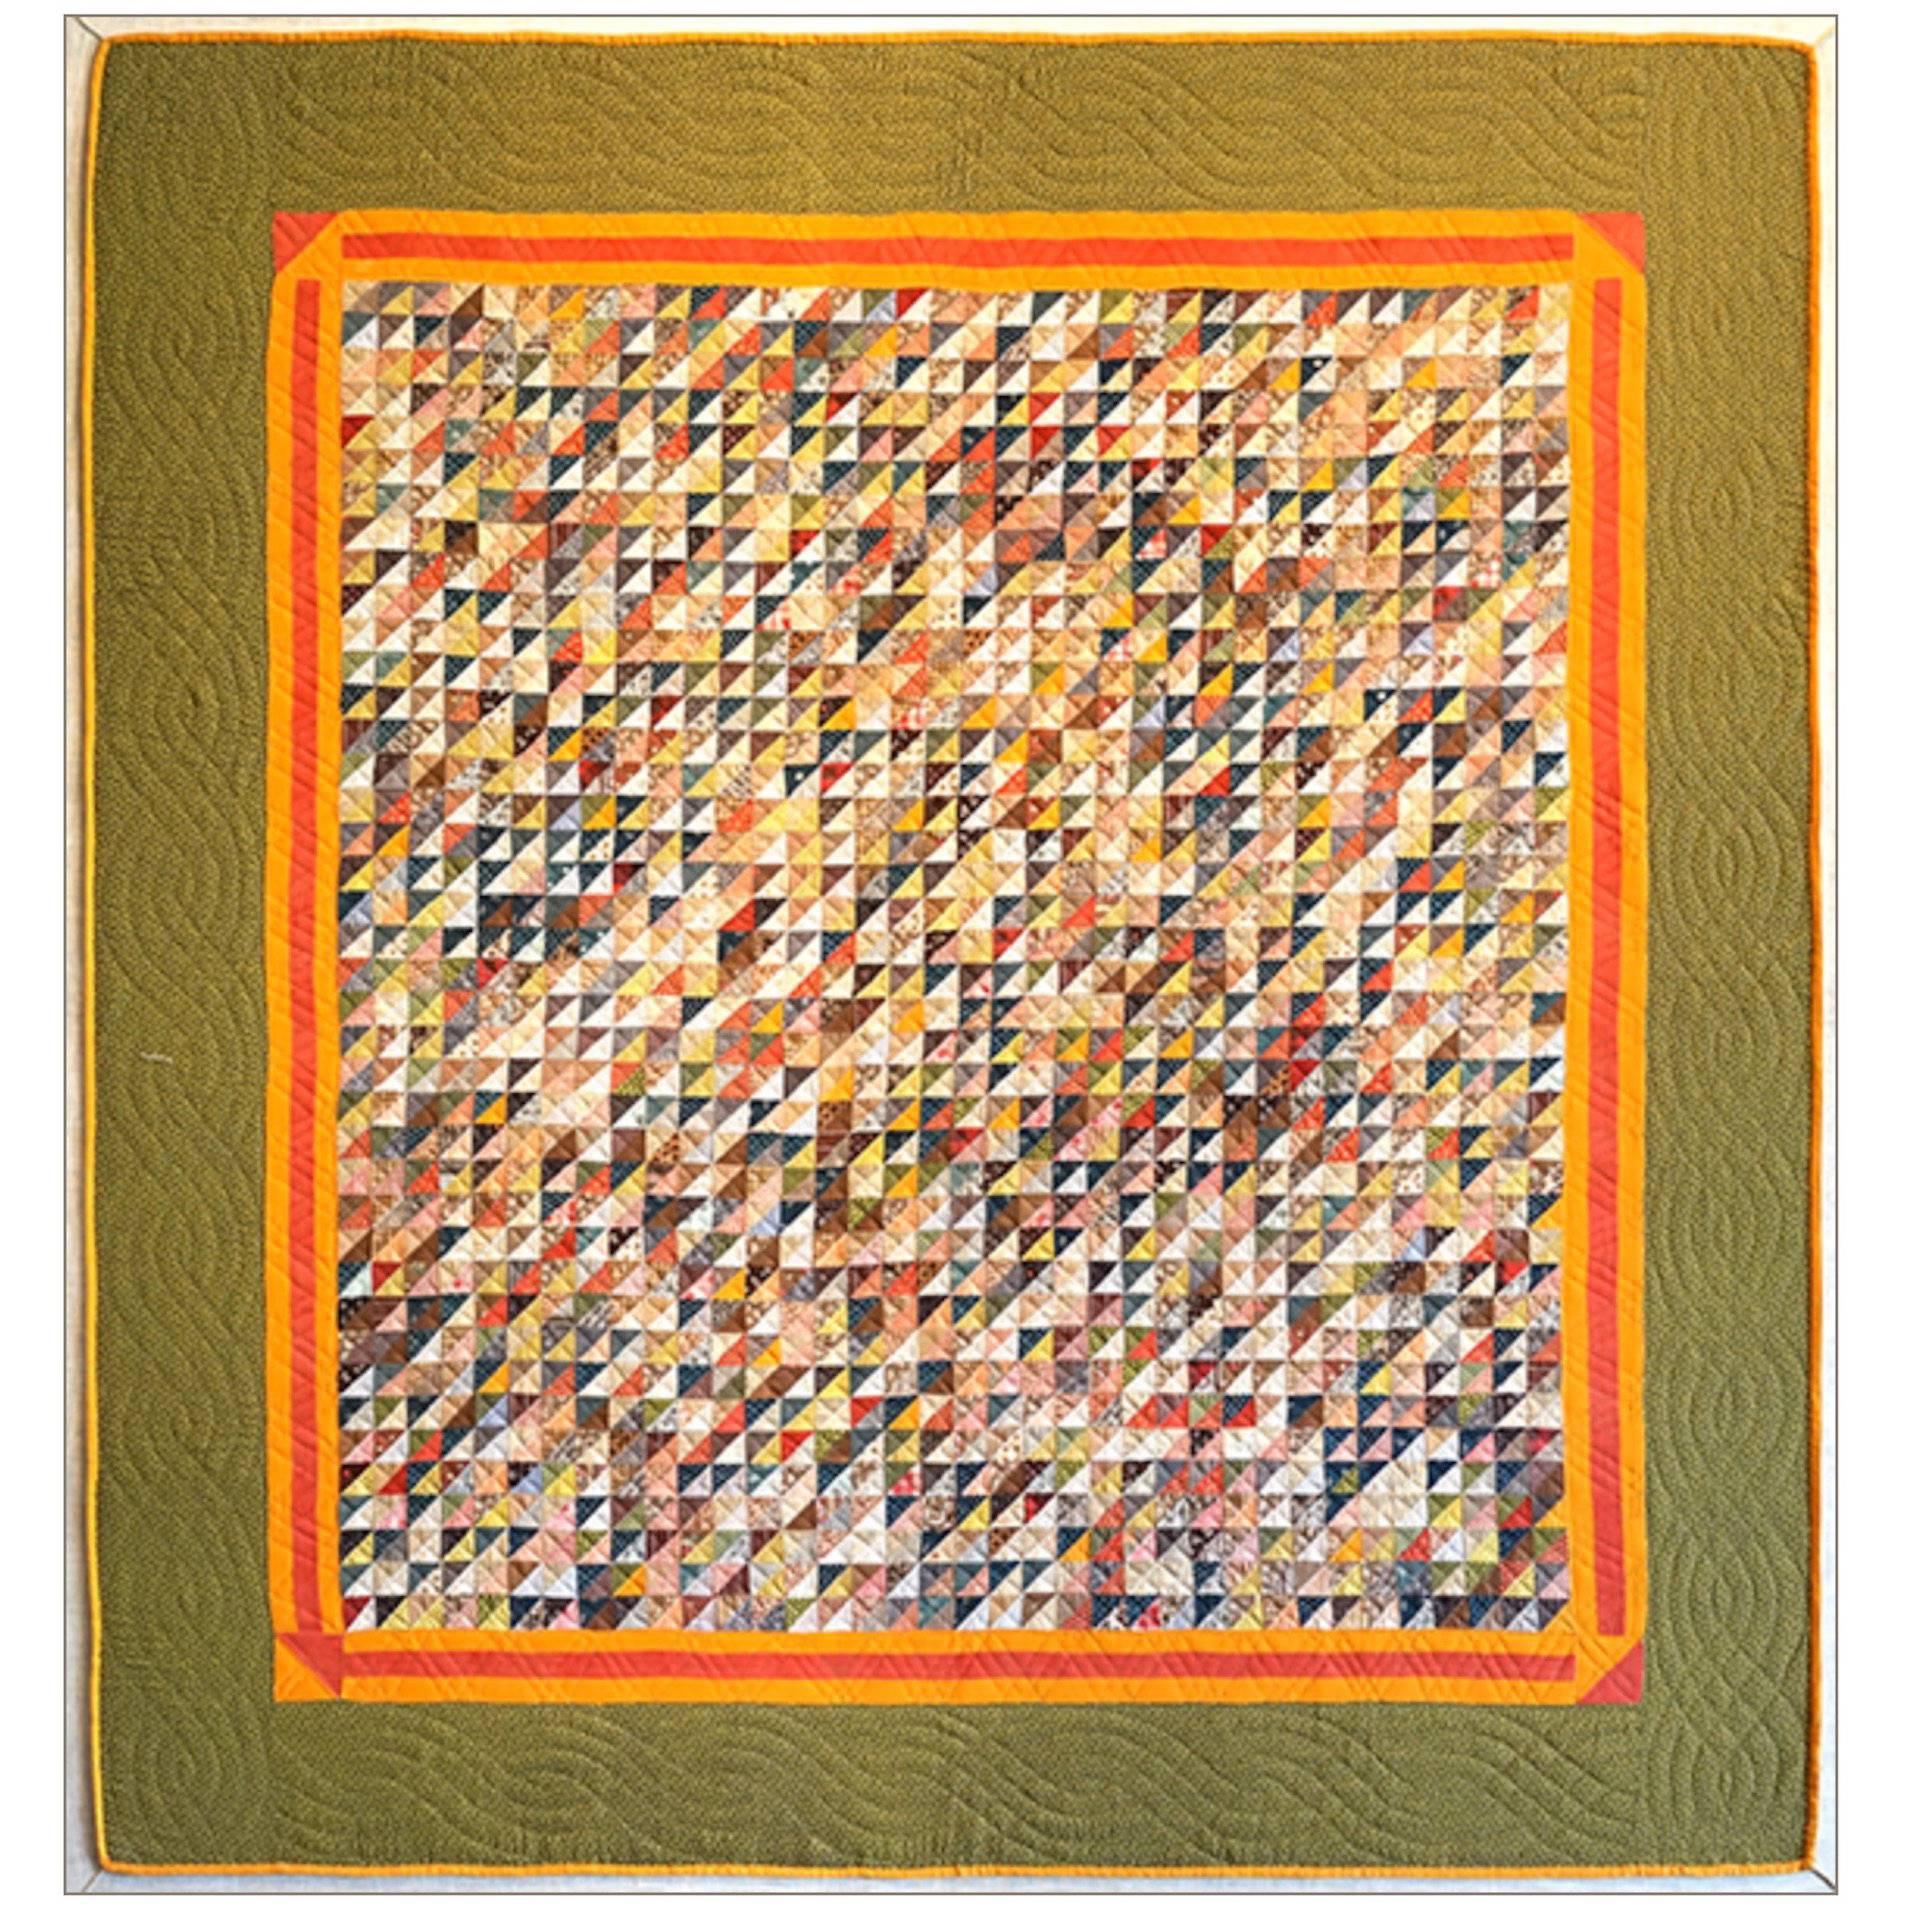 Monumental Micro Triangular Cut Feed Sack Folk Art Quilt Mounted on Canvas